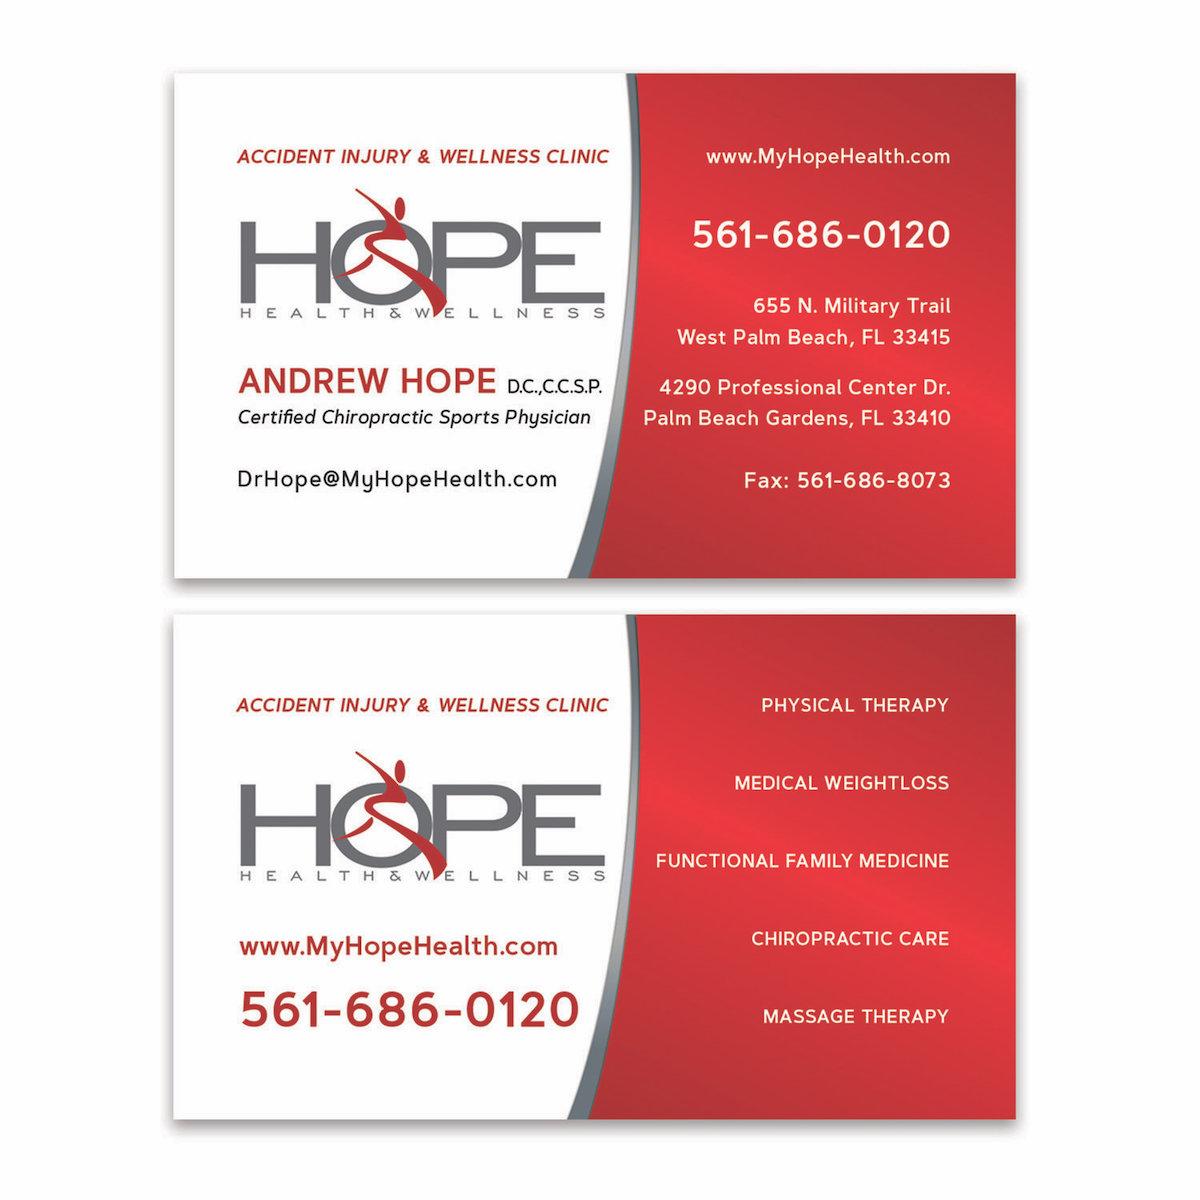 Chiropractor Business Card Design - West Palm Beach